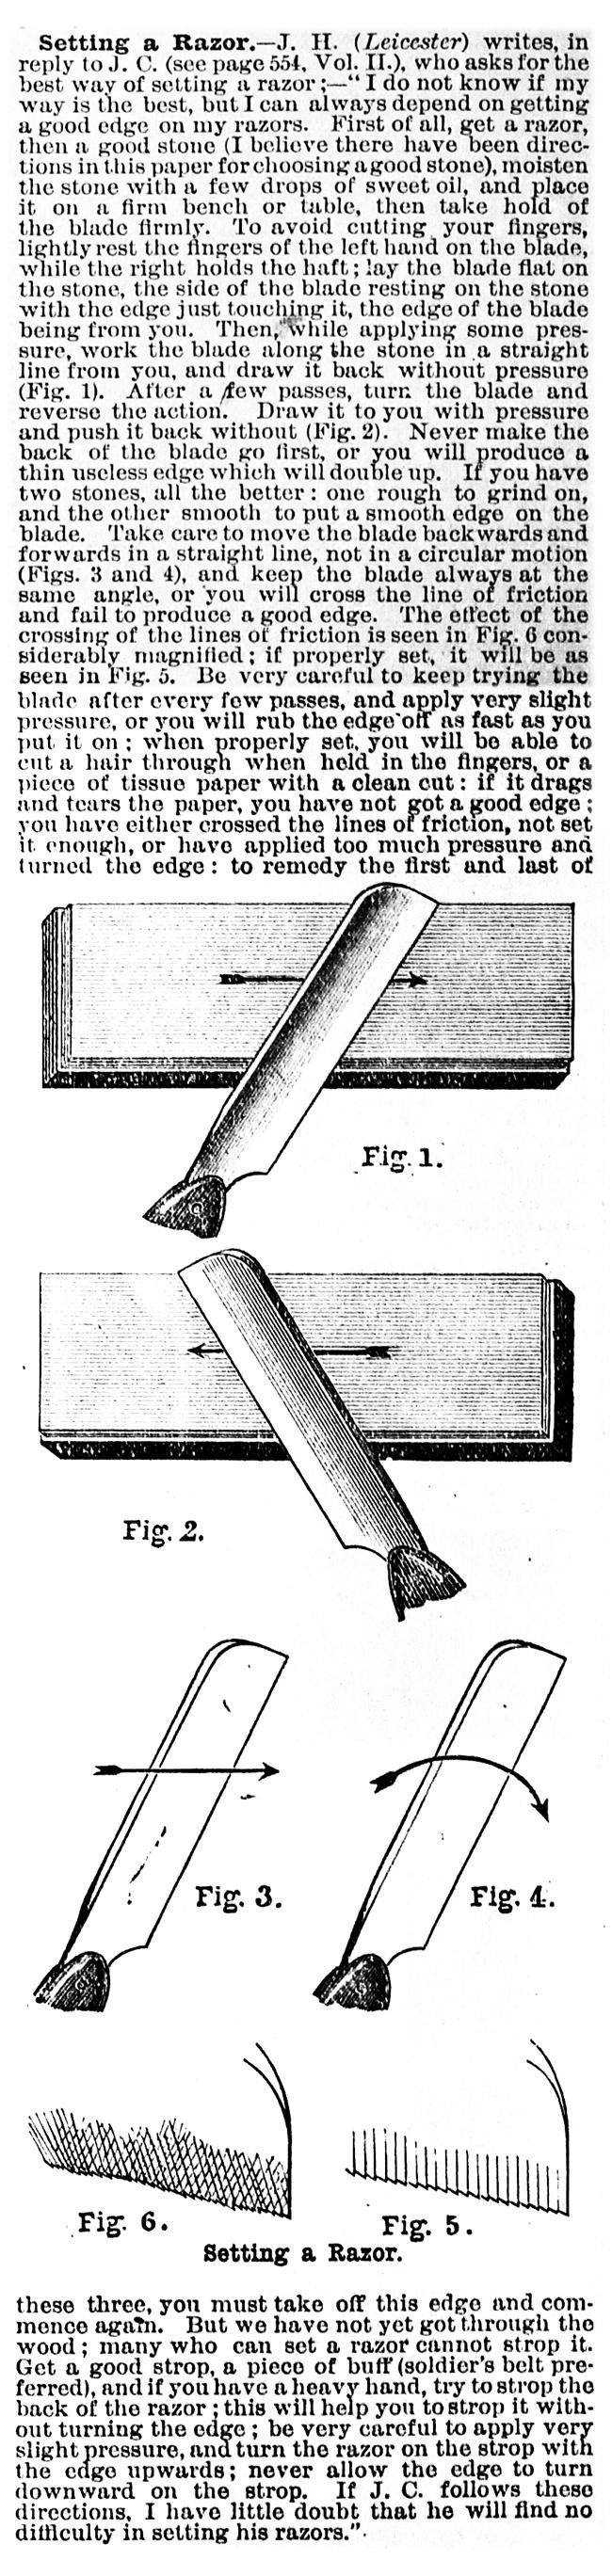 WORK No. 100- Published February 14, 1891 7